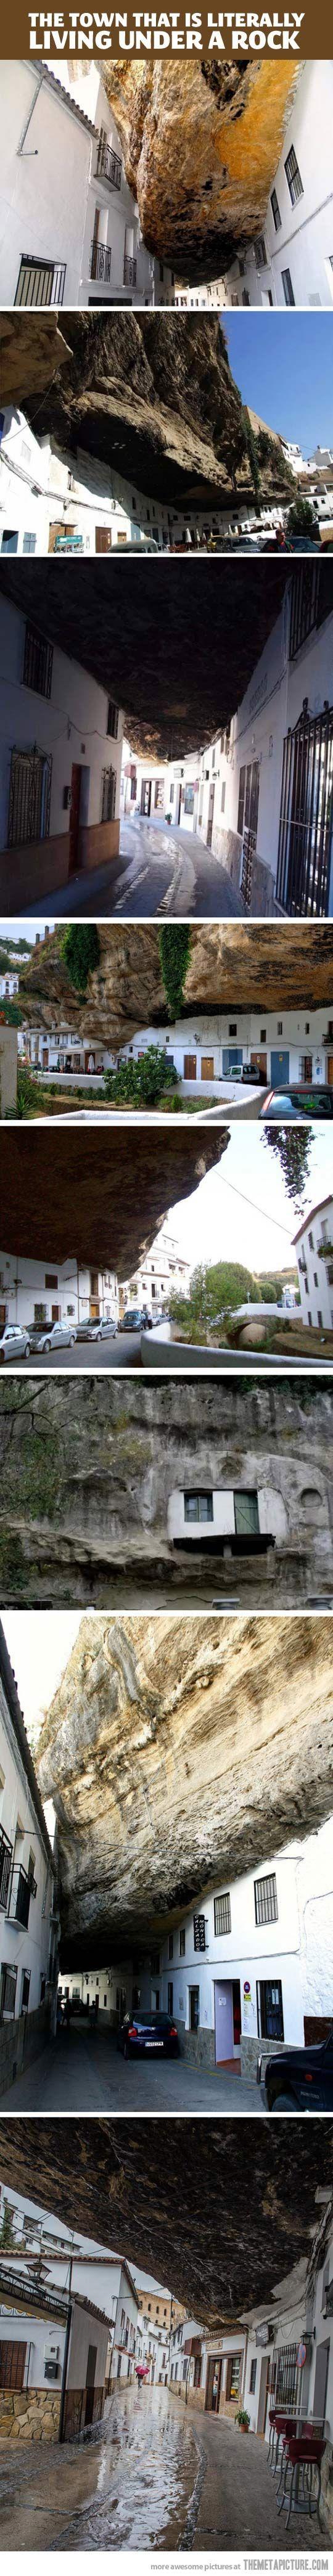 The town that is literally living under a rock…Setenil de las Bodegas, Cadiz, Spain